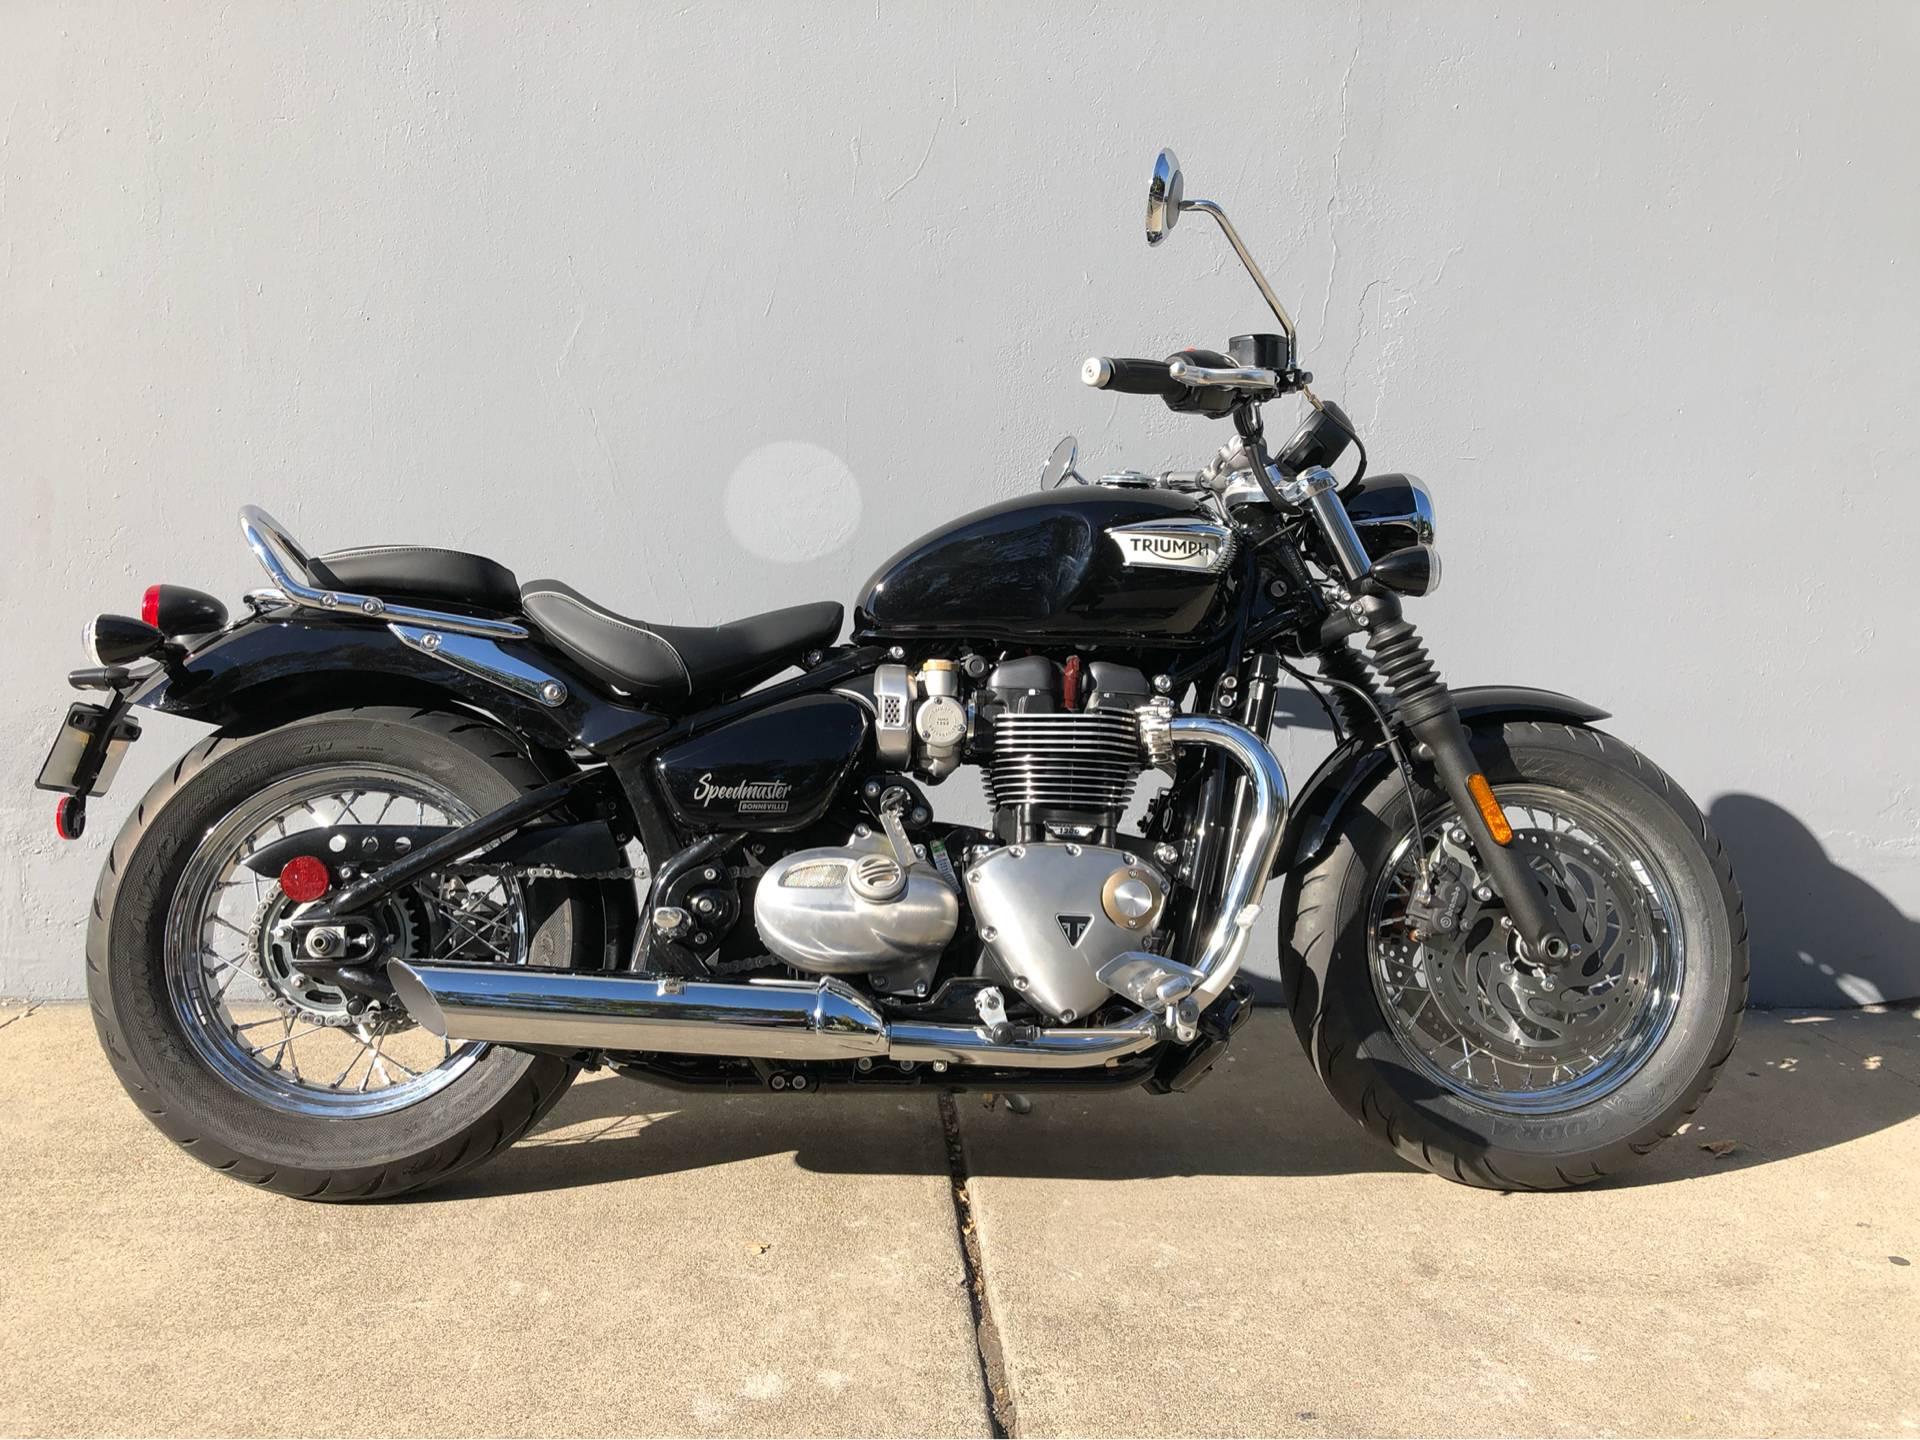 New 2019 Triumph Bonneville Speedmaster Motorcycles In San Jose Ca